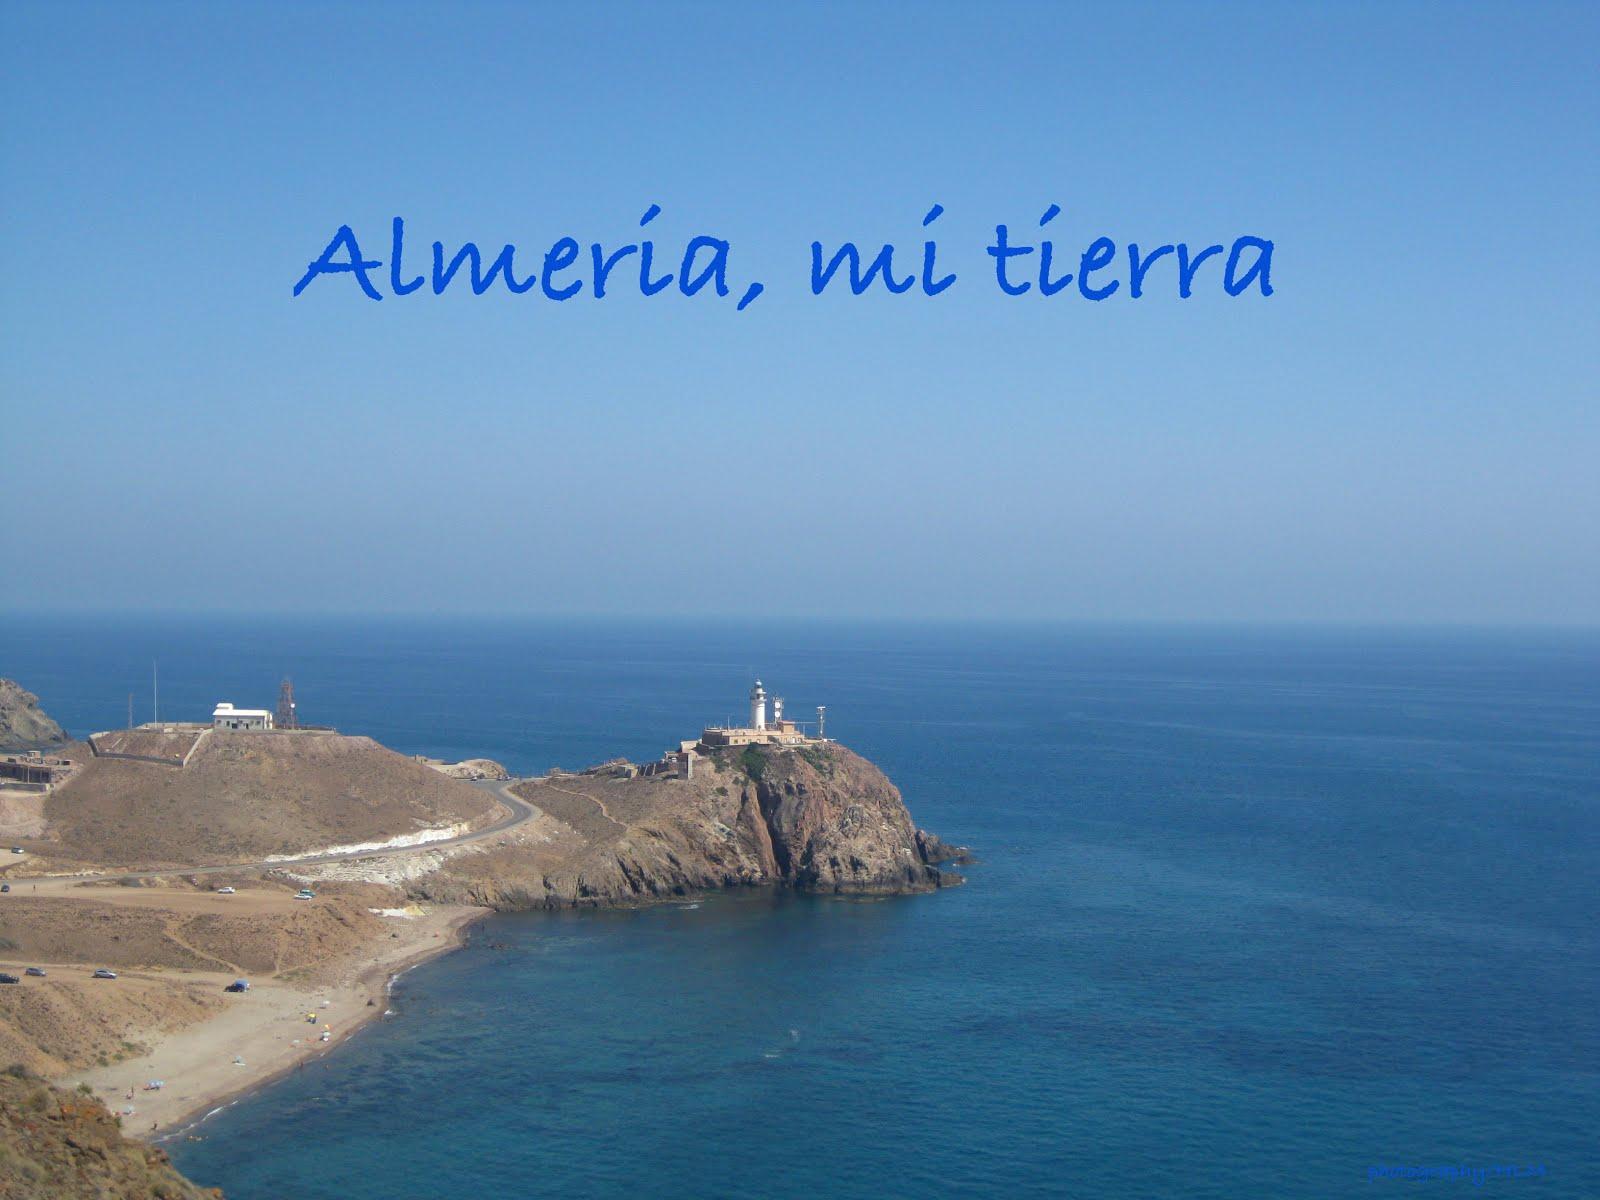 Almeria, Mi tierra